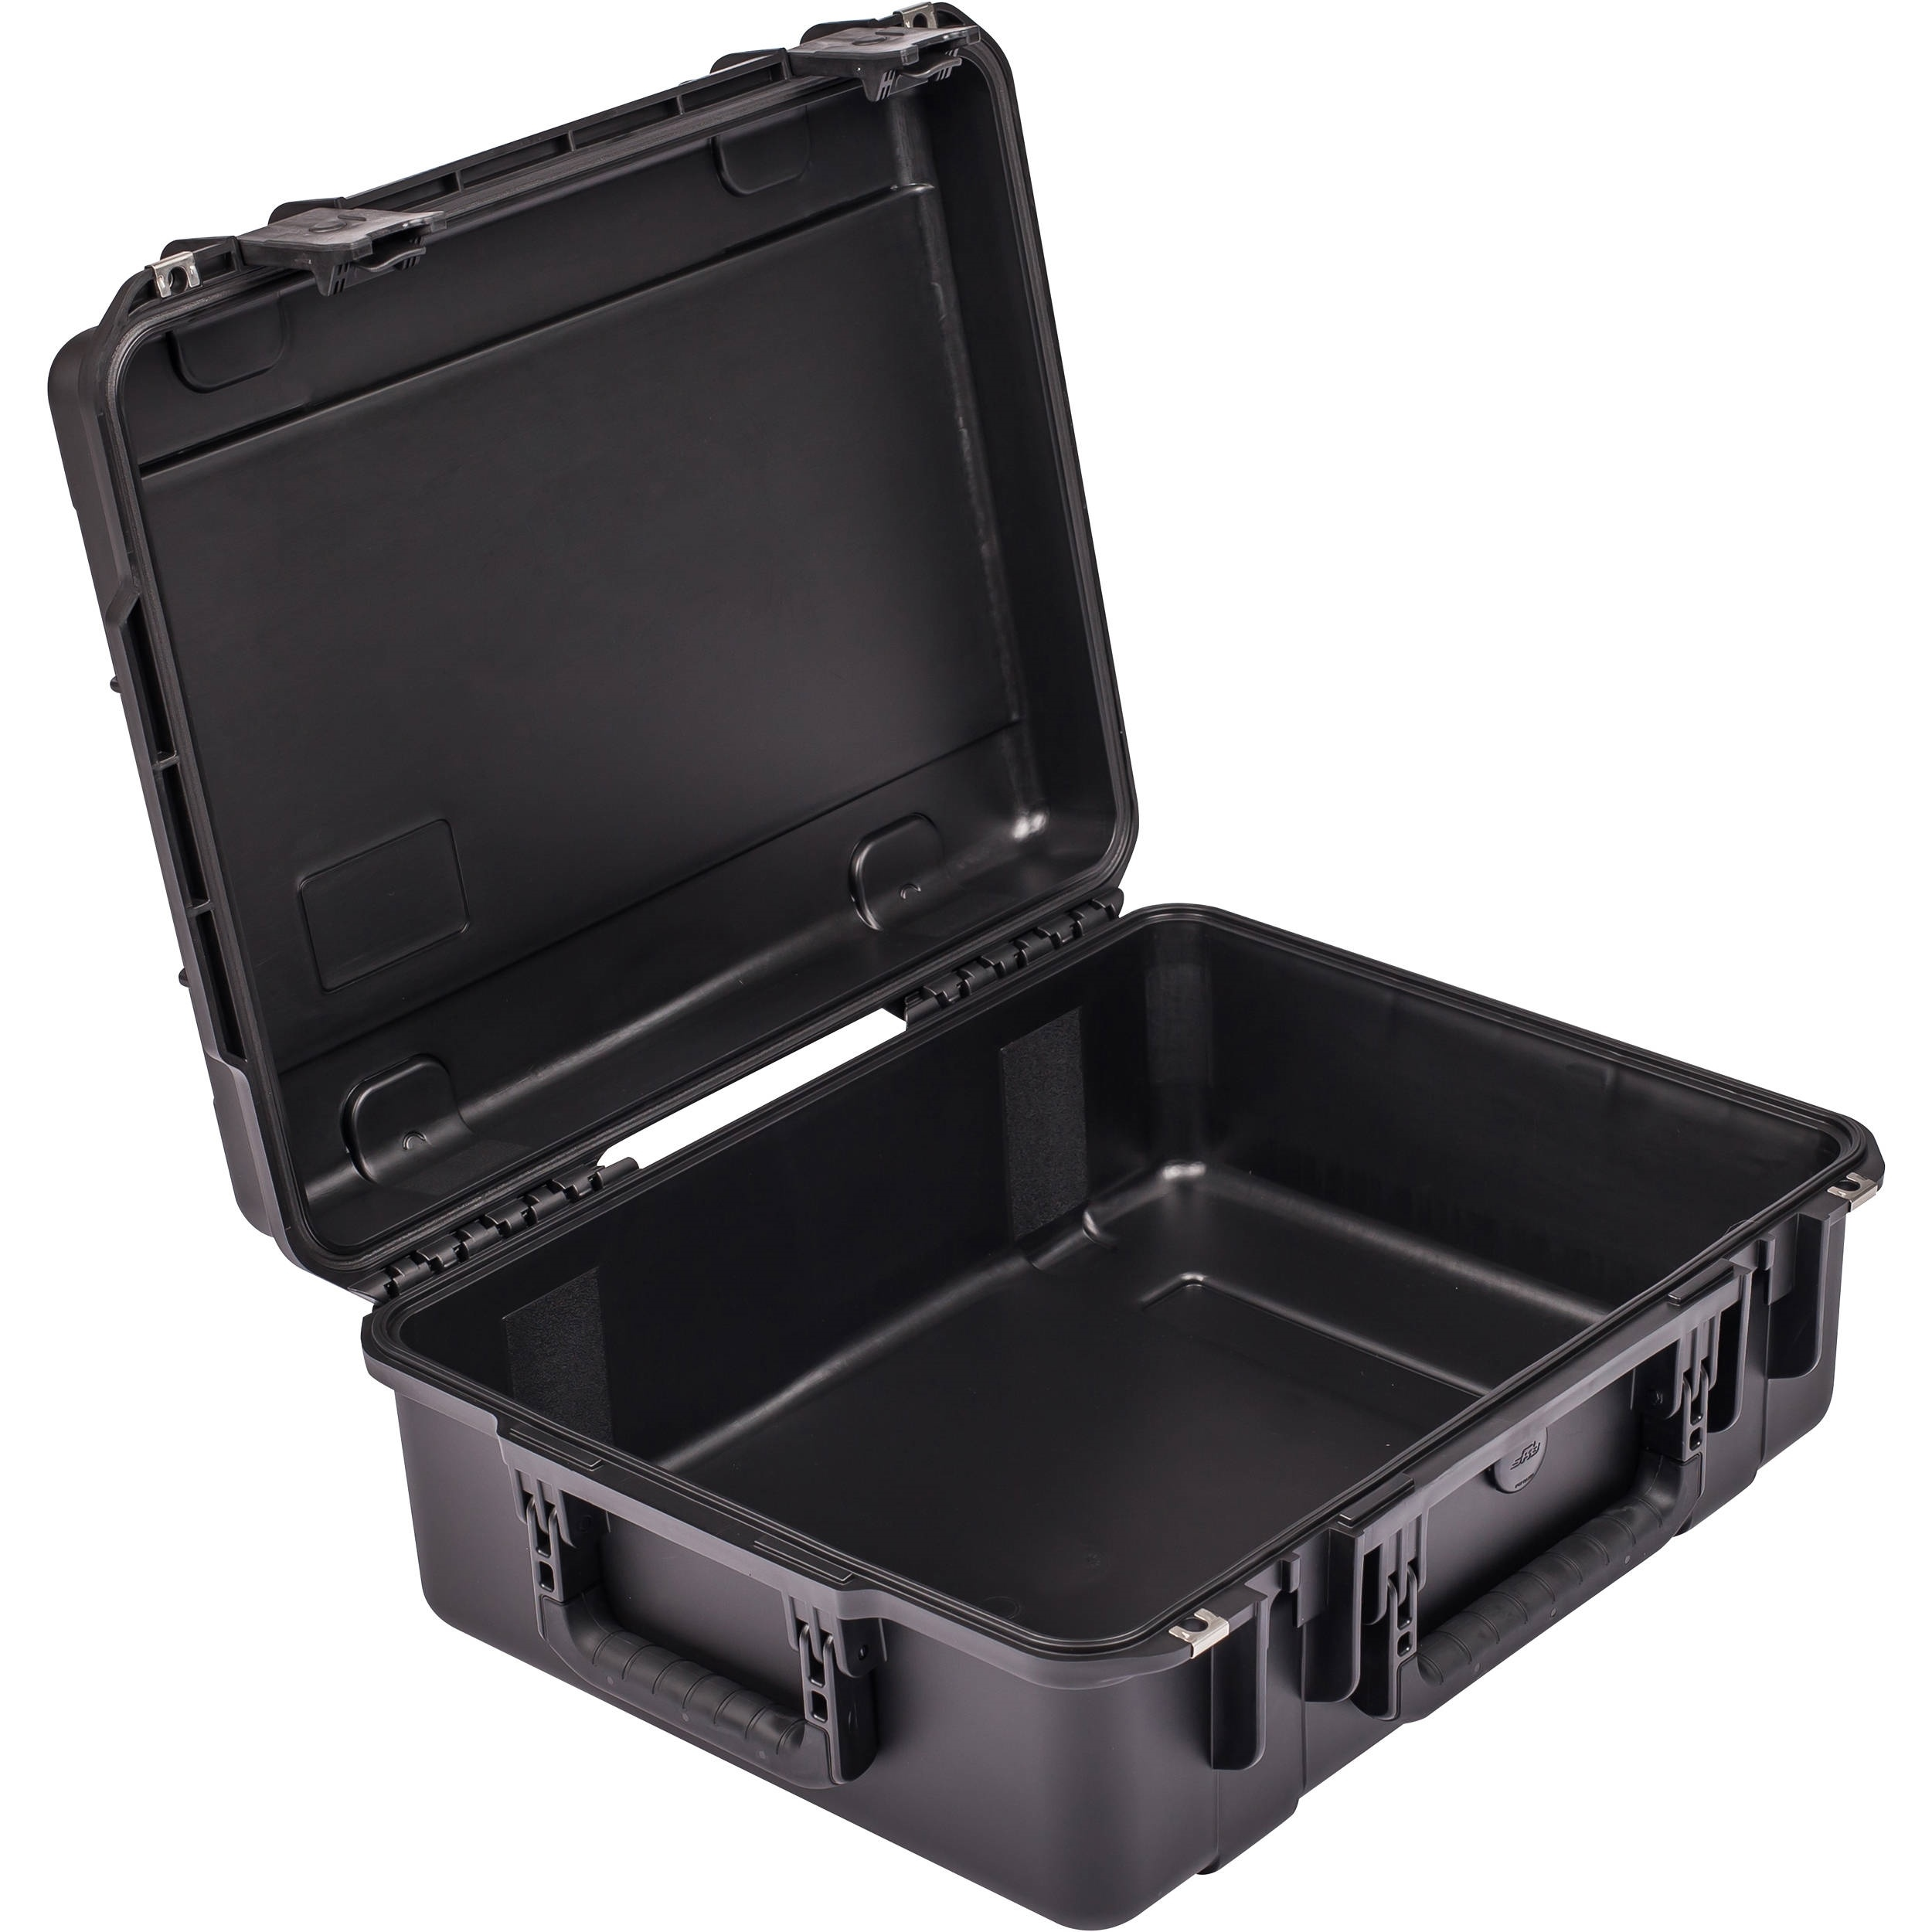 SKB 3I-2015-7B-E Mil-Std Waterproof Case 17.7cm Deep (Black)